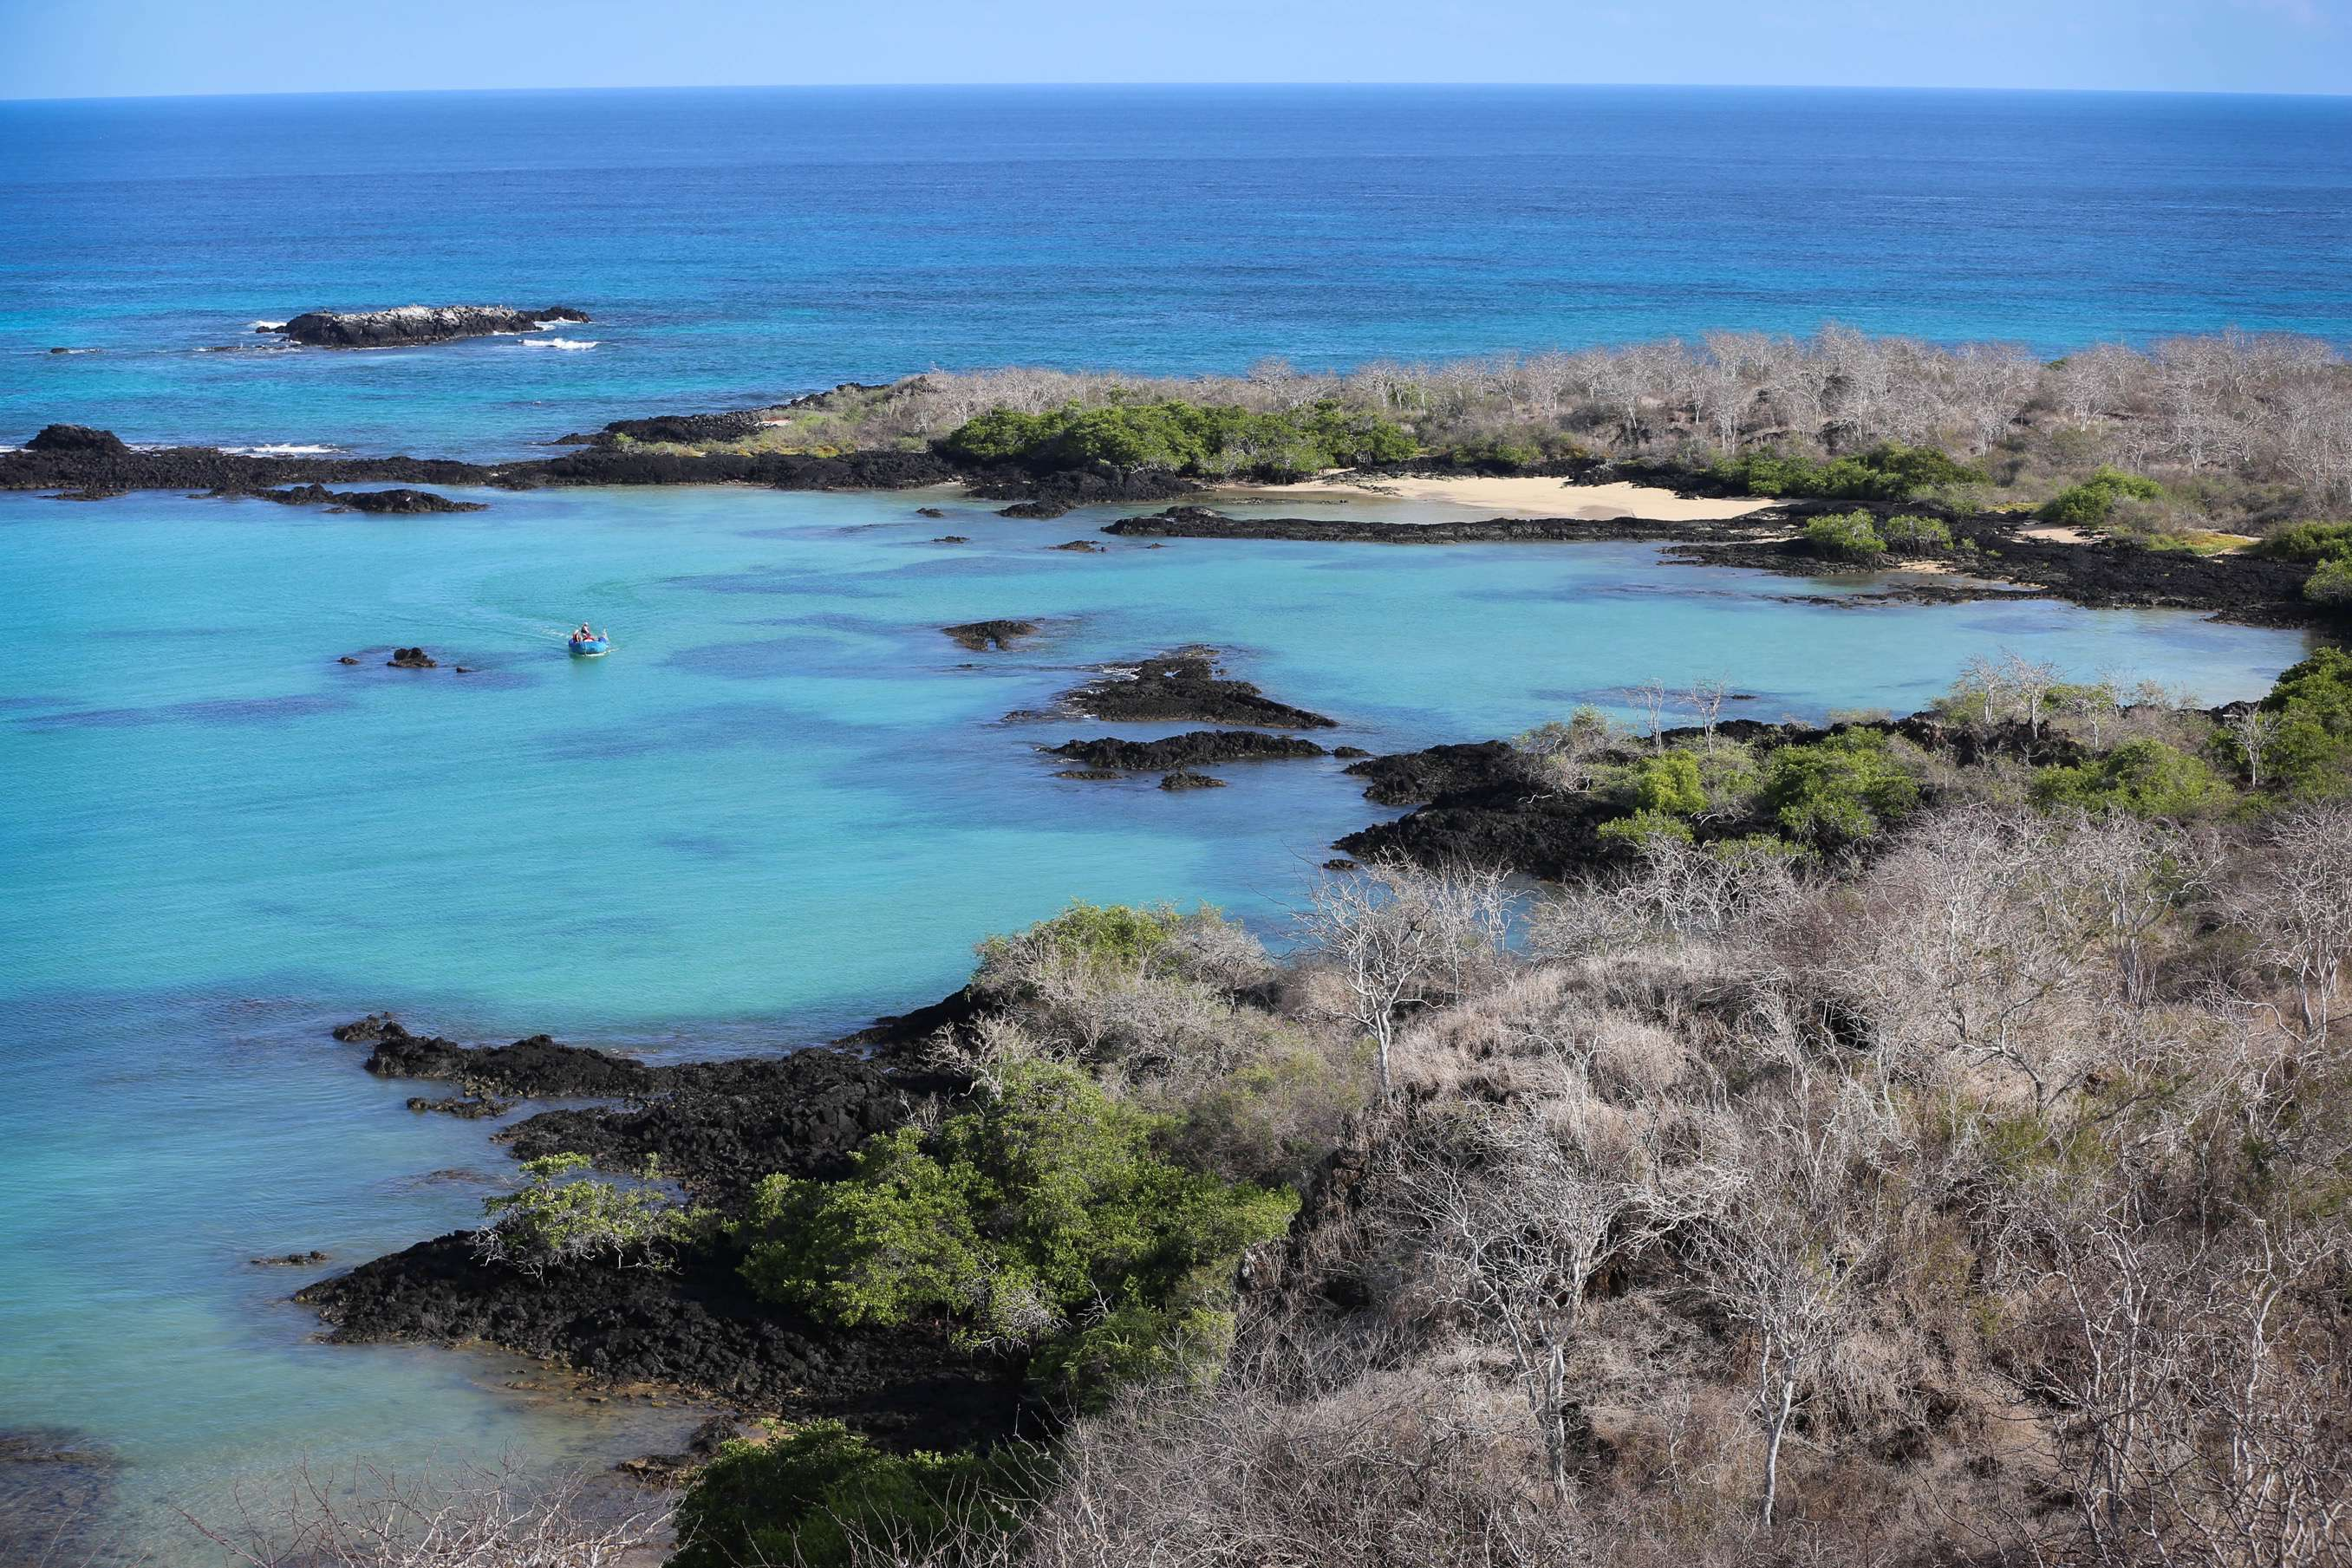 galapagos islands name origin